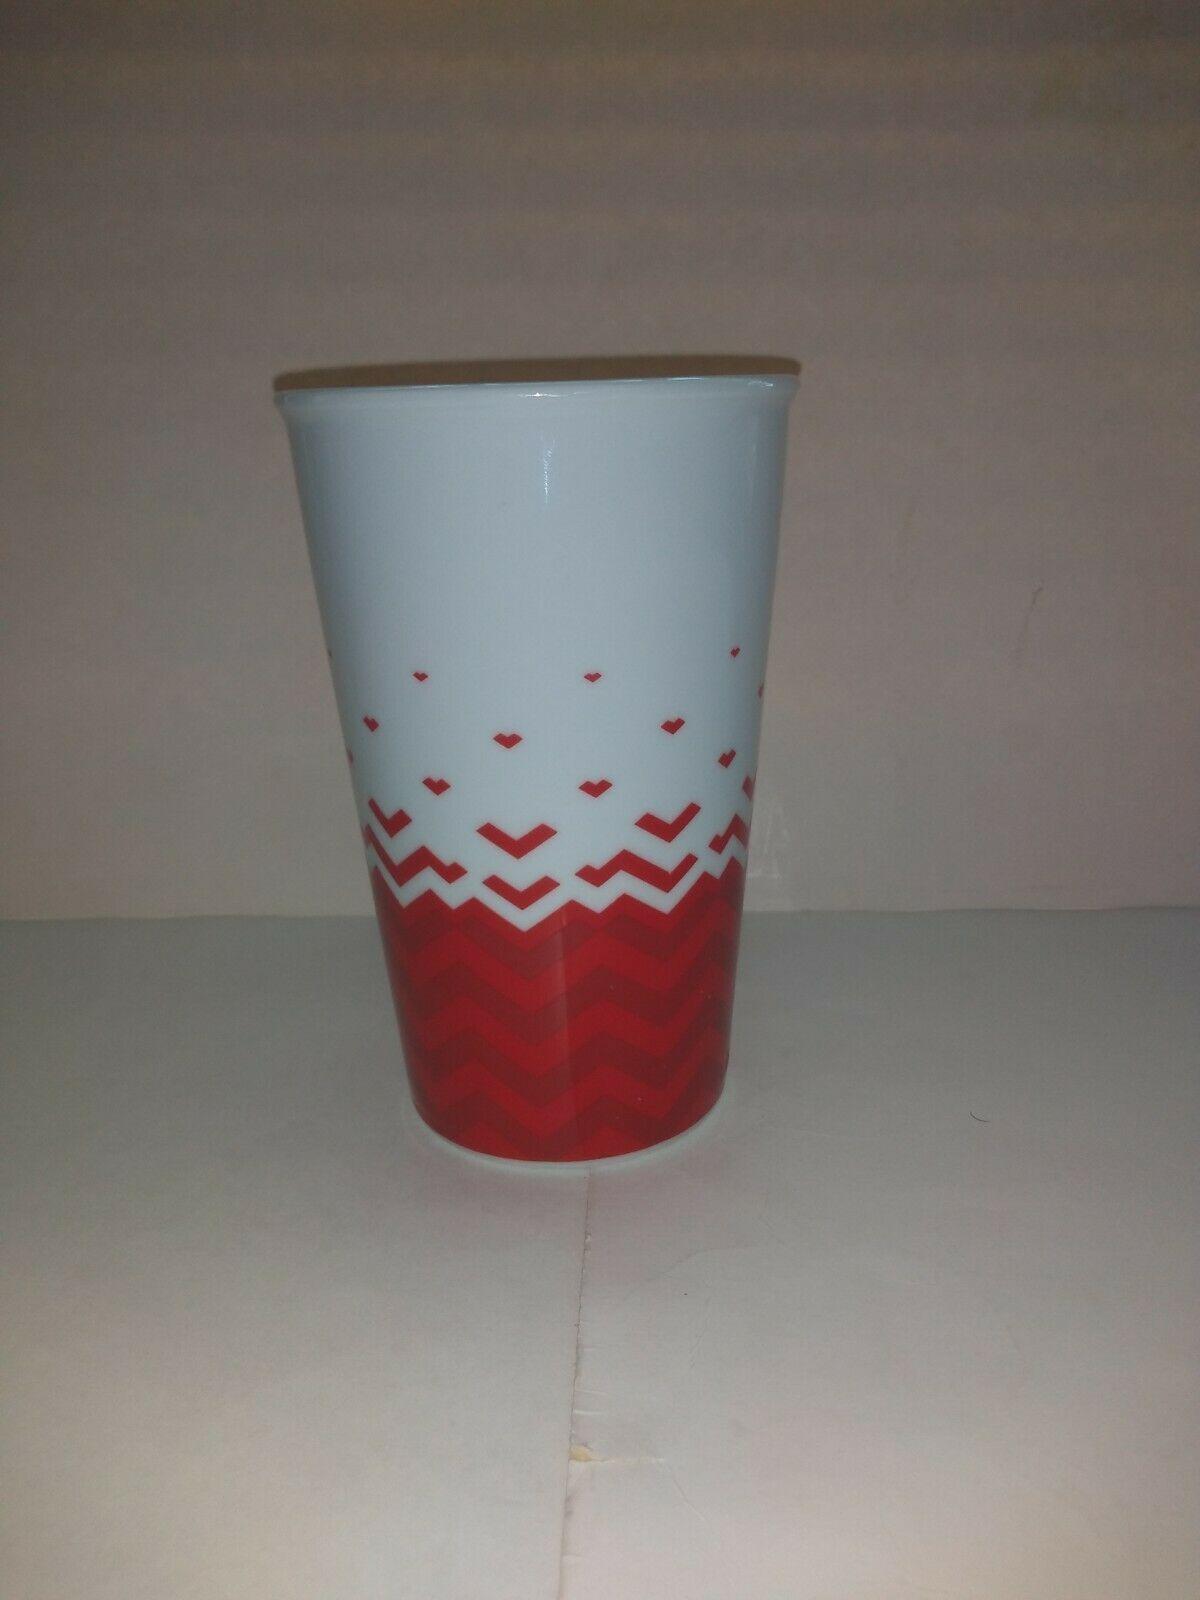 Starbucks 2013 Red White Hearts Valentines Day Mug 22 OZ  image 4